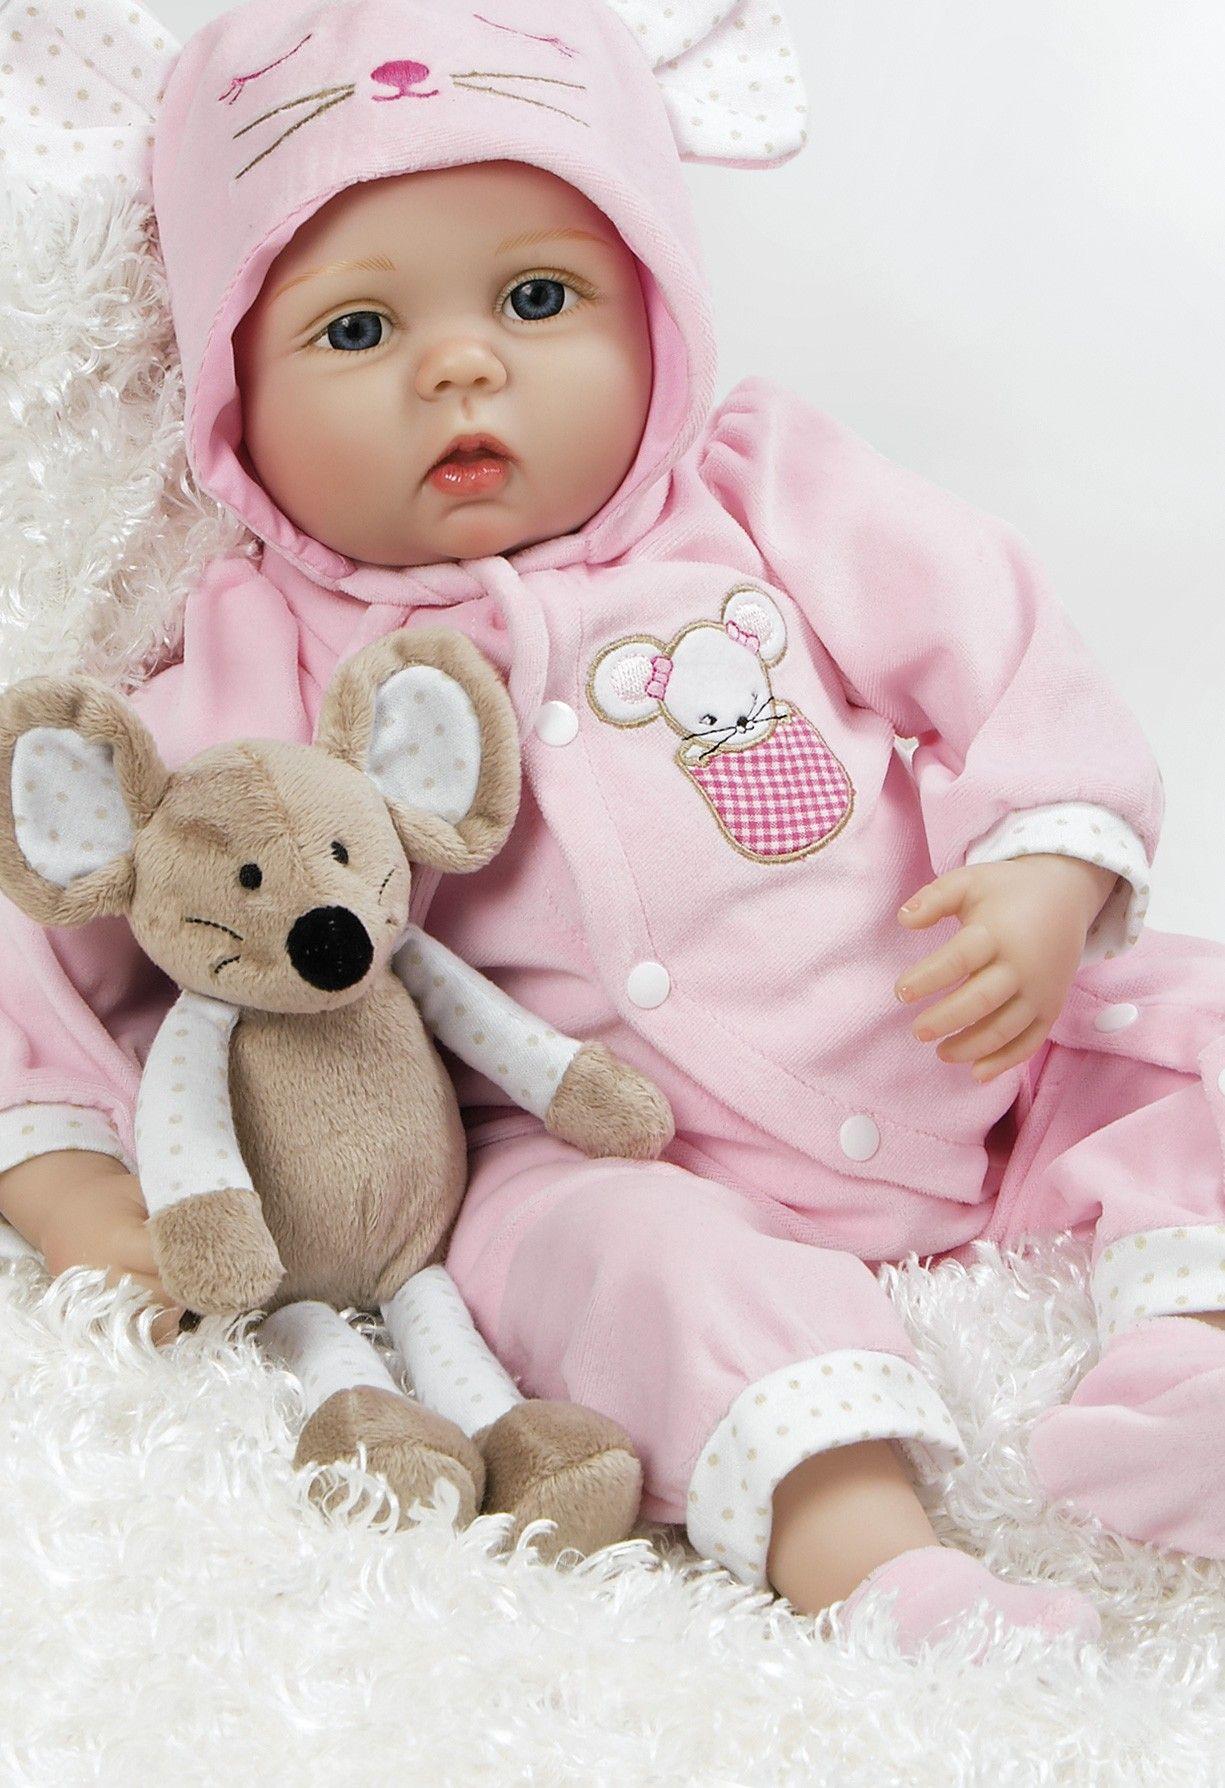 Mia Mouse Baby dolls, Newborn baby dolls, Baby girl dolls